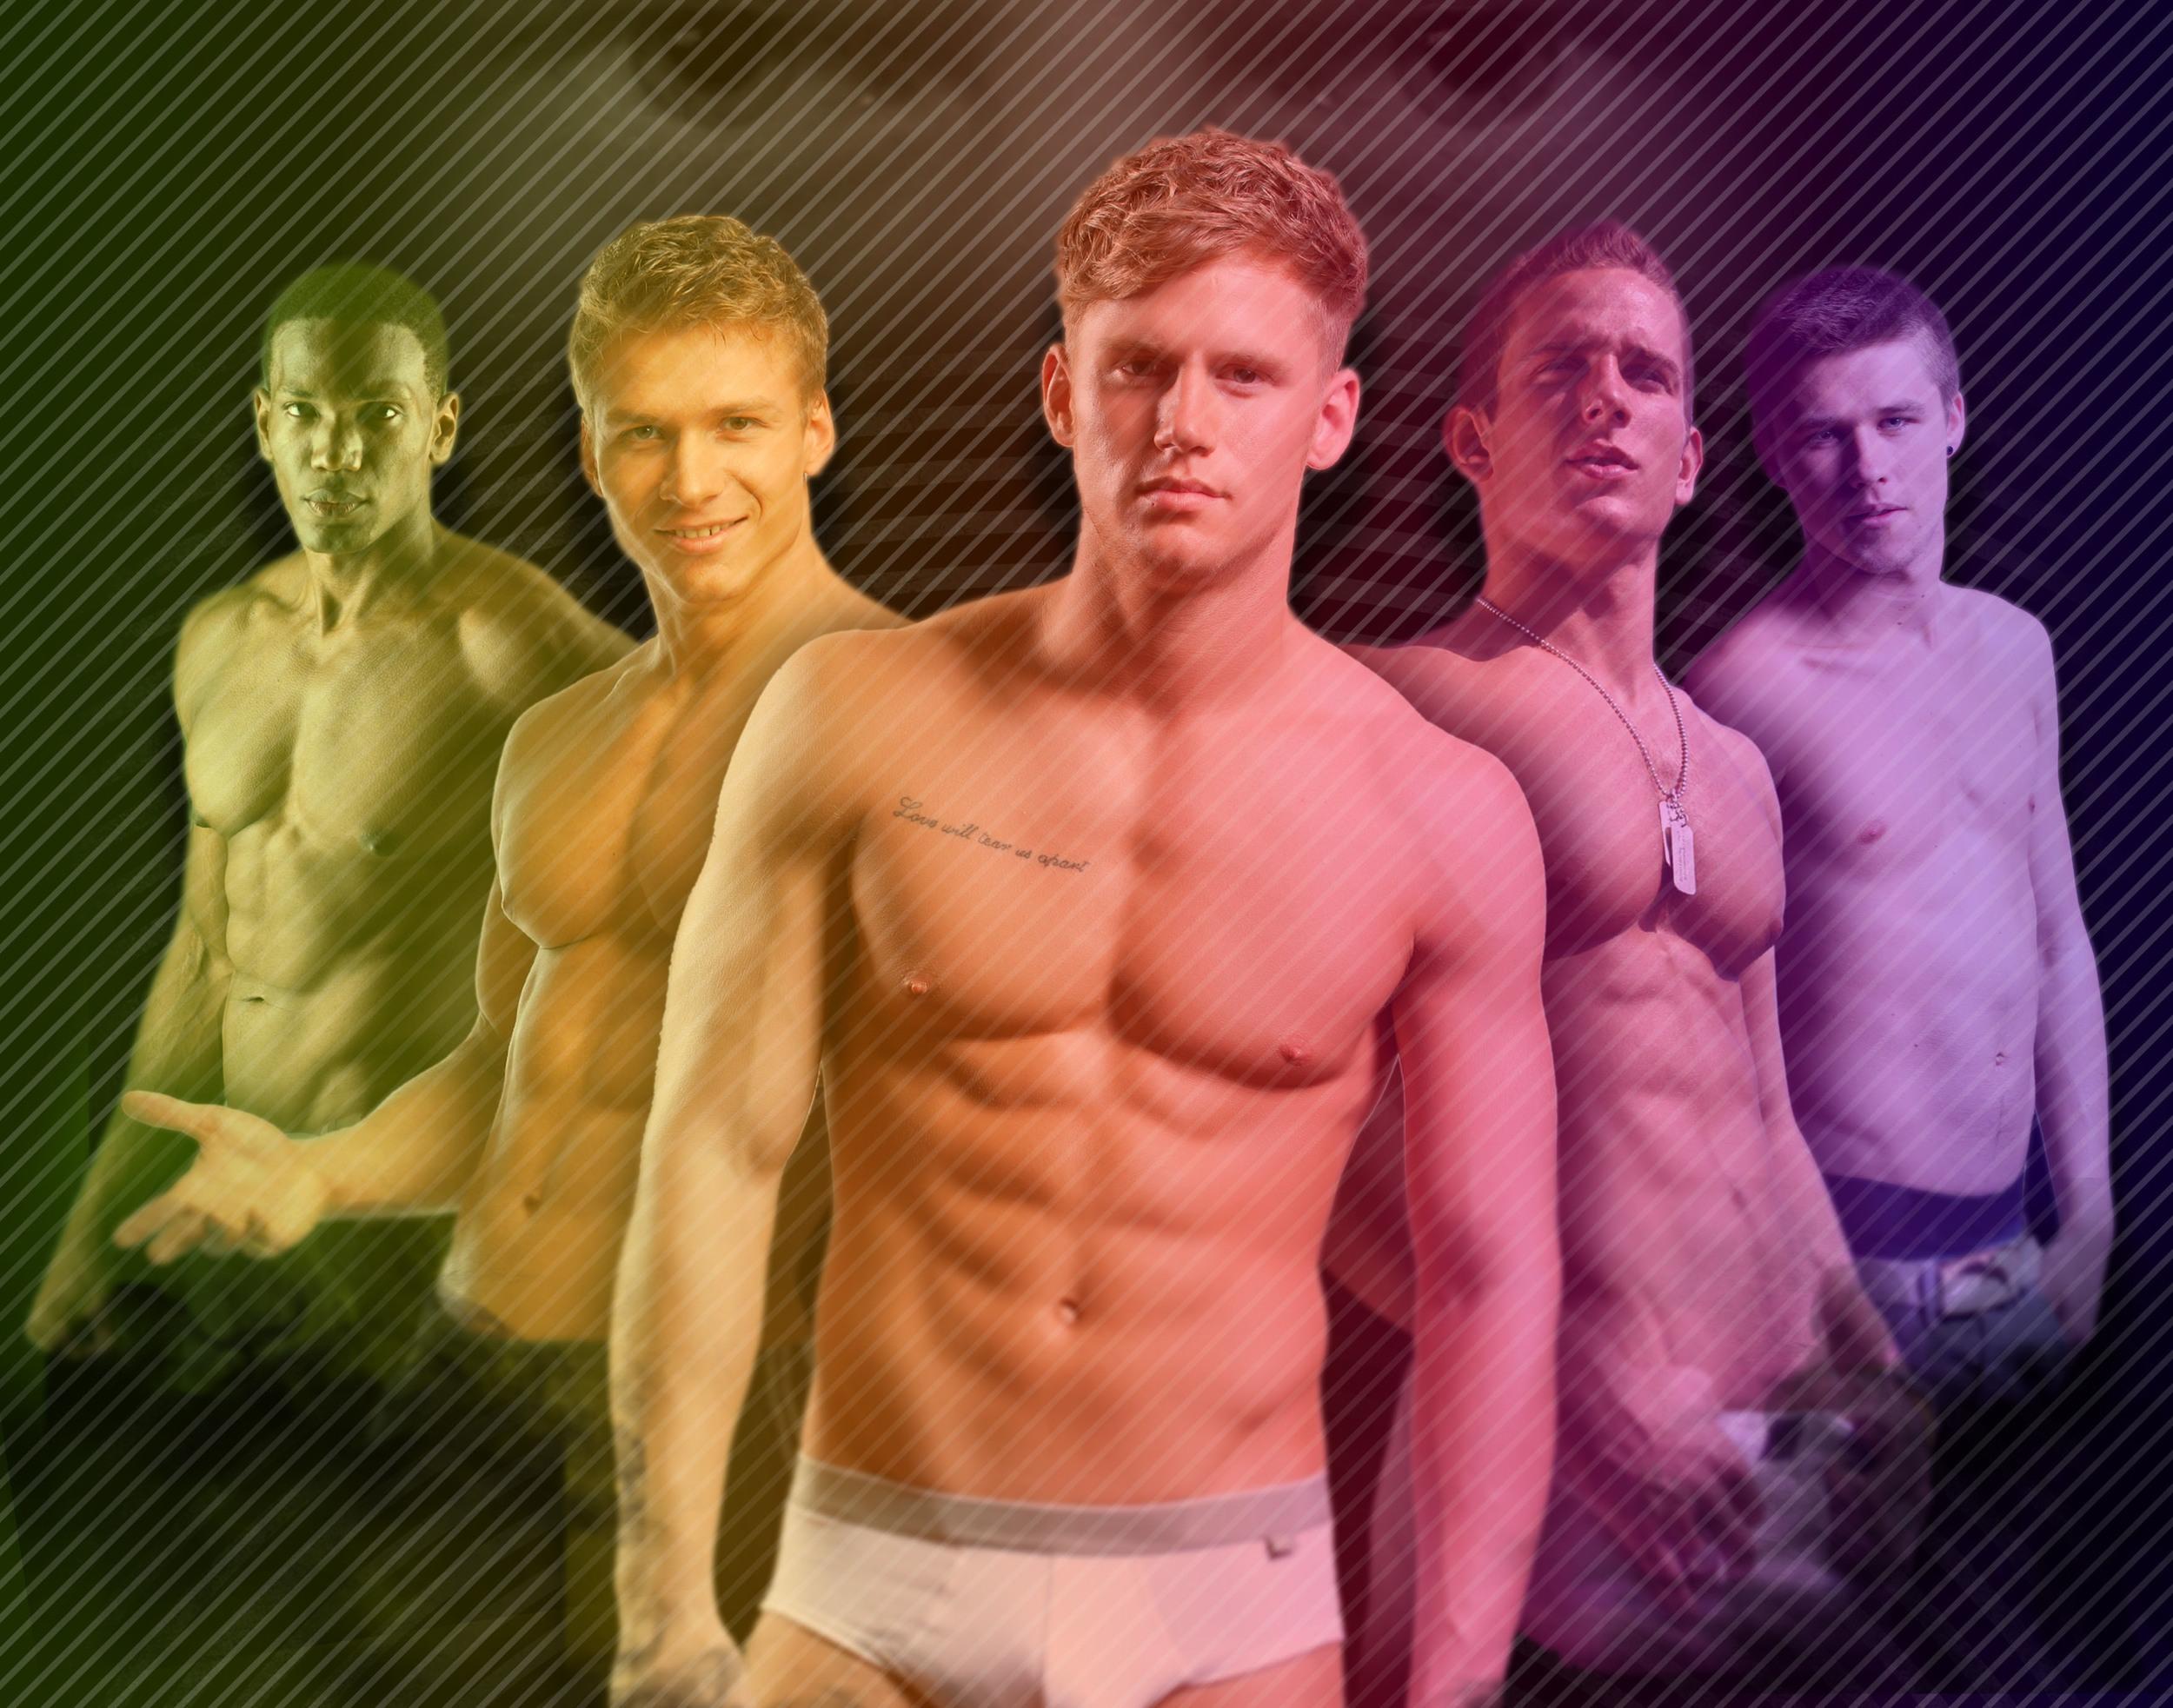 gay meet Uk